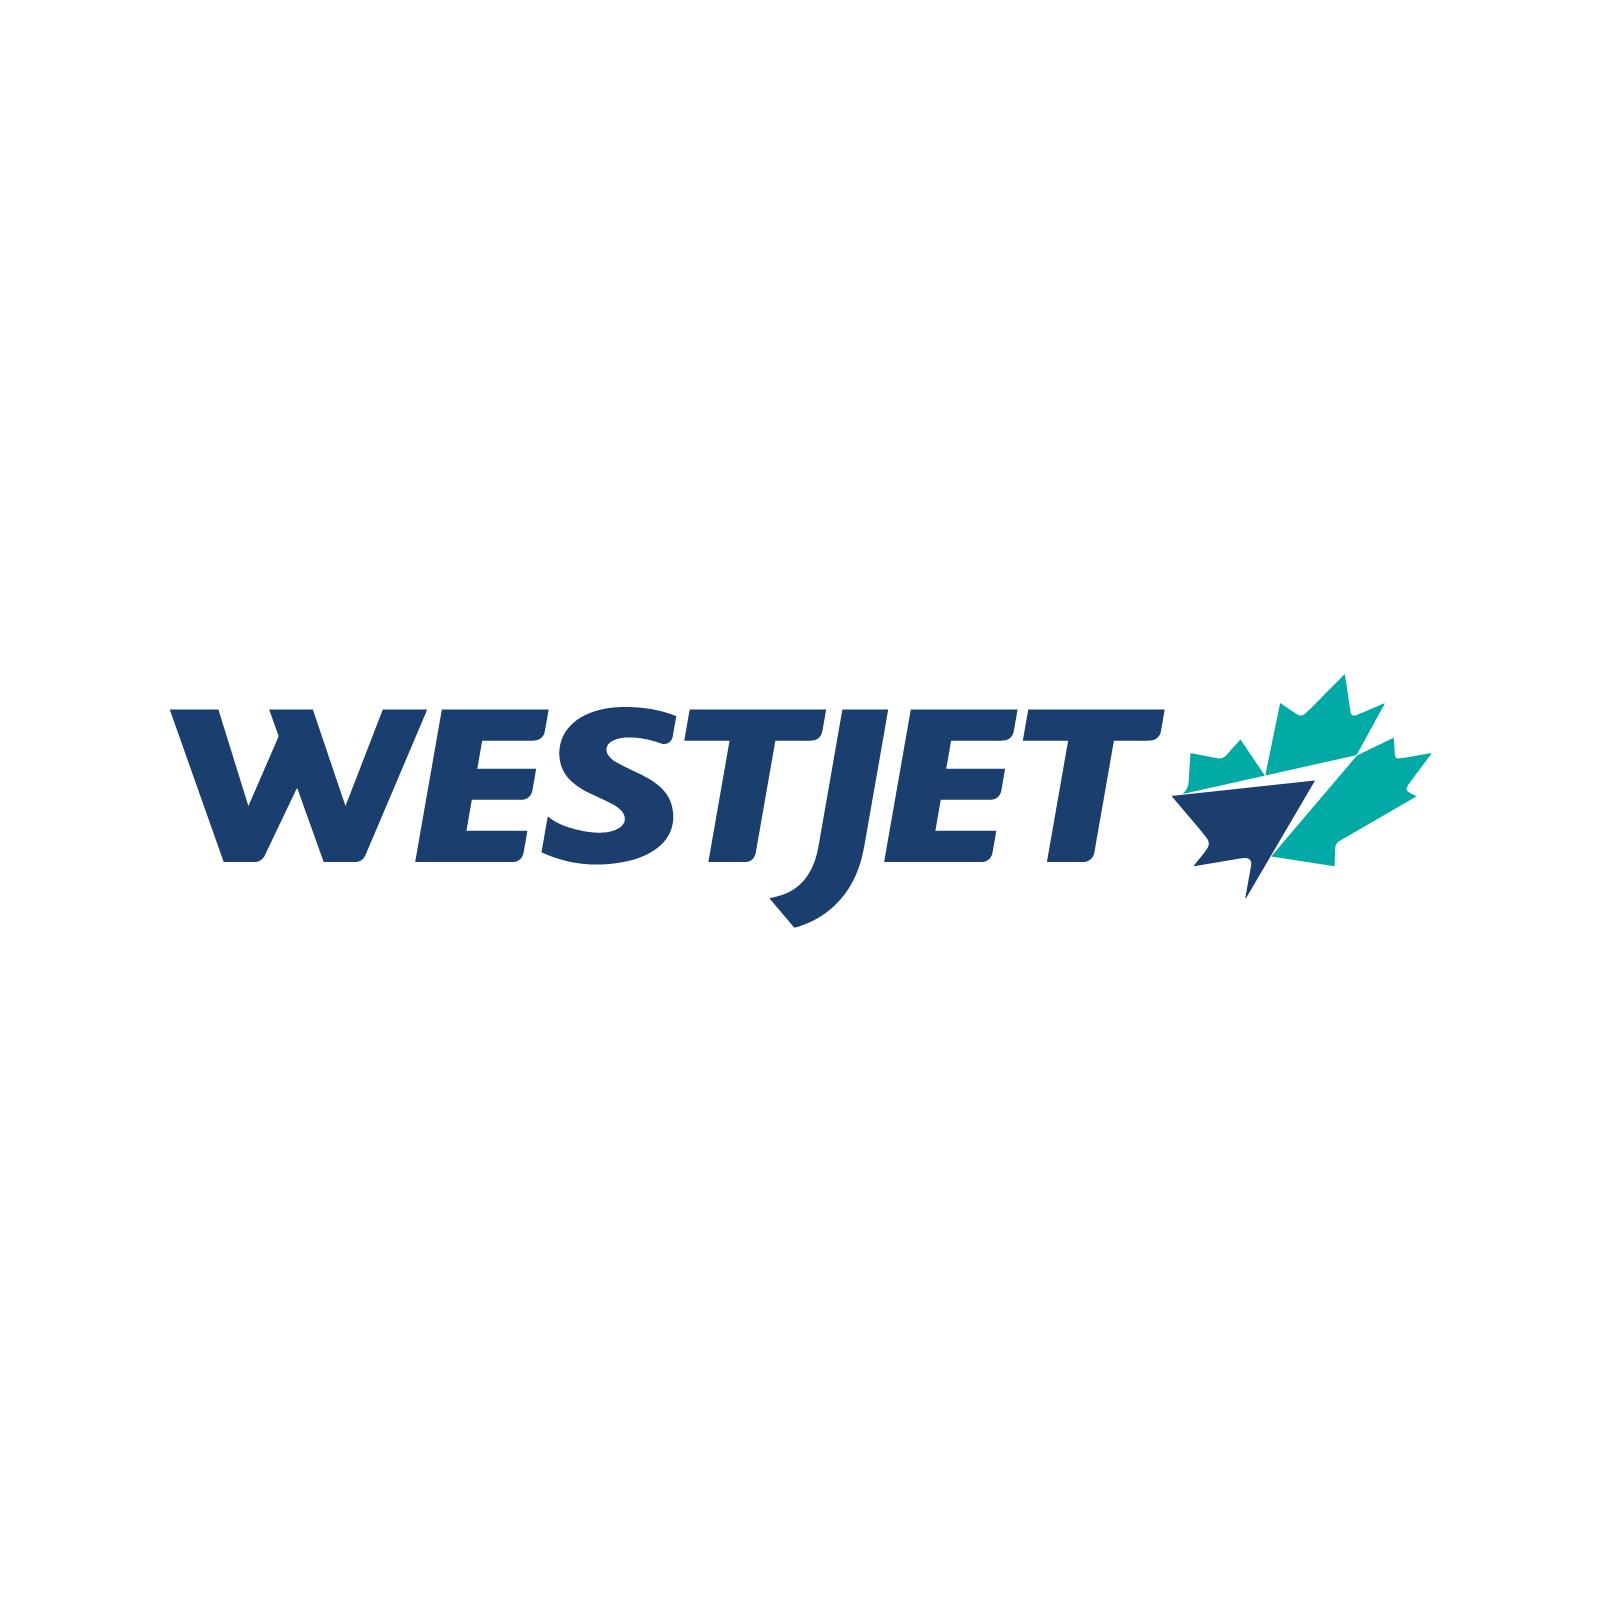 Press Logos_West Jet.png